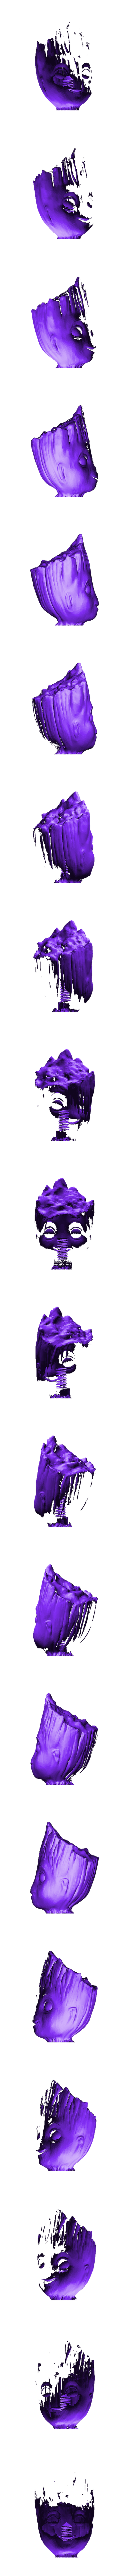 cabeza groot.stl Download free STL file Groot Book Separator • 3D printing design, gothamstorecol